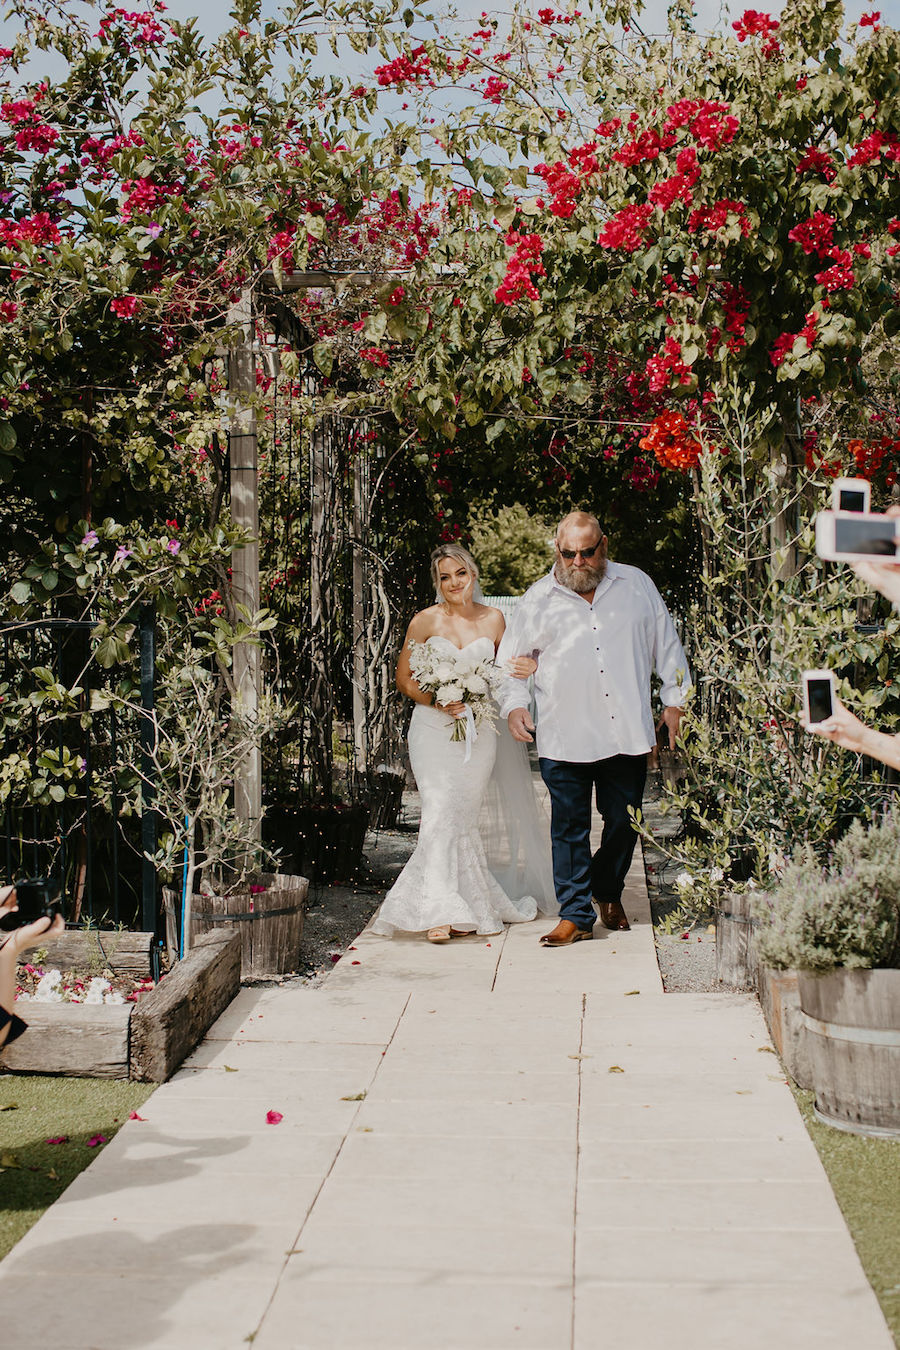 tweed-coast-weddings-wedding-venue-osteria-casuarina-ceremony-reception-5D3A6915.jpg